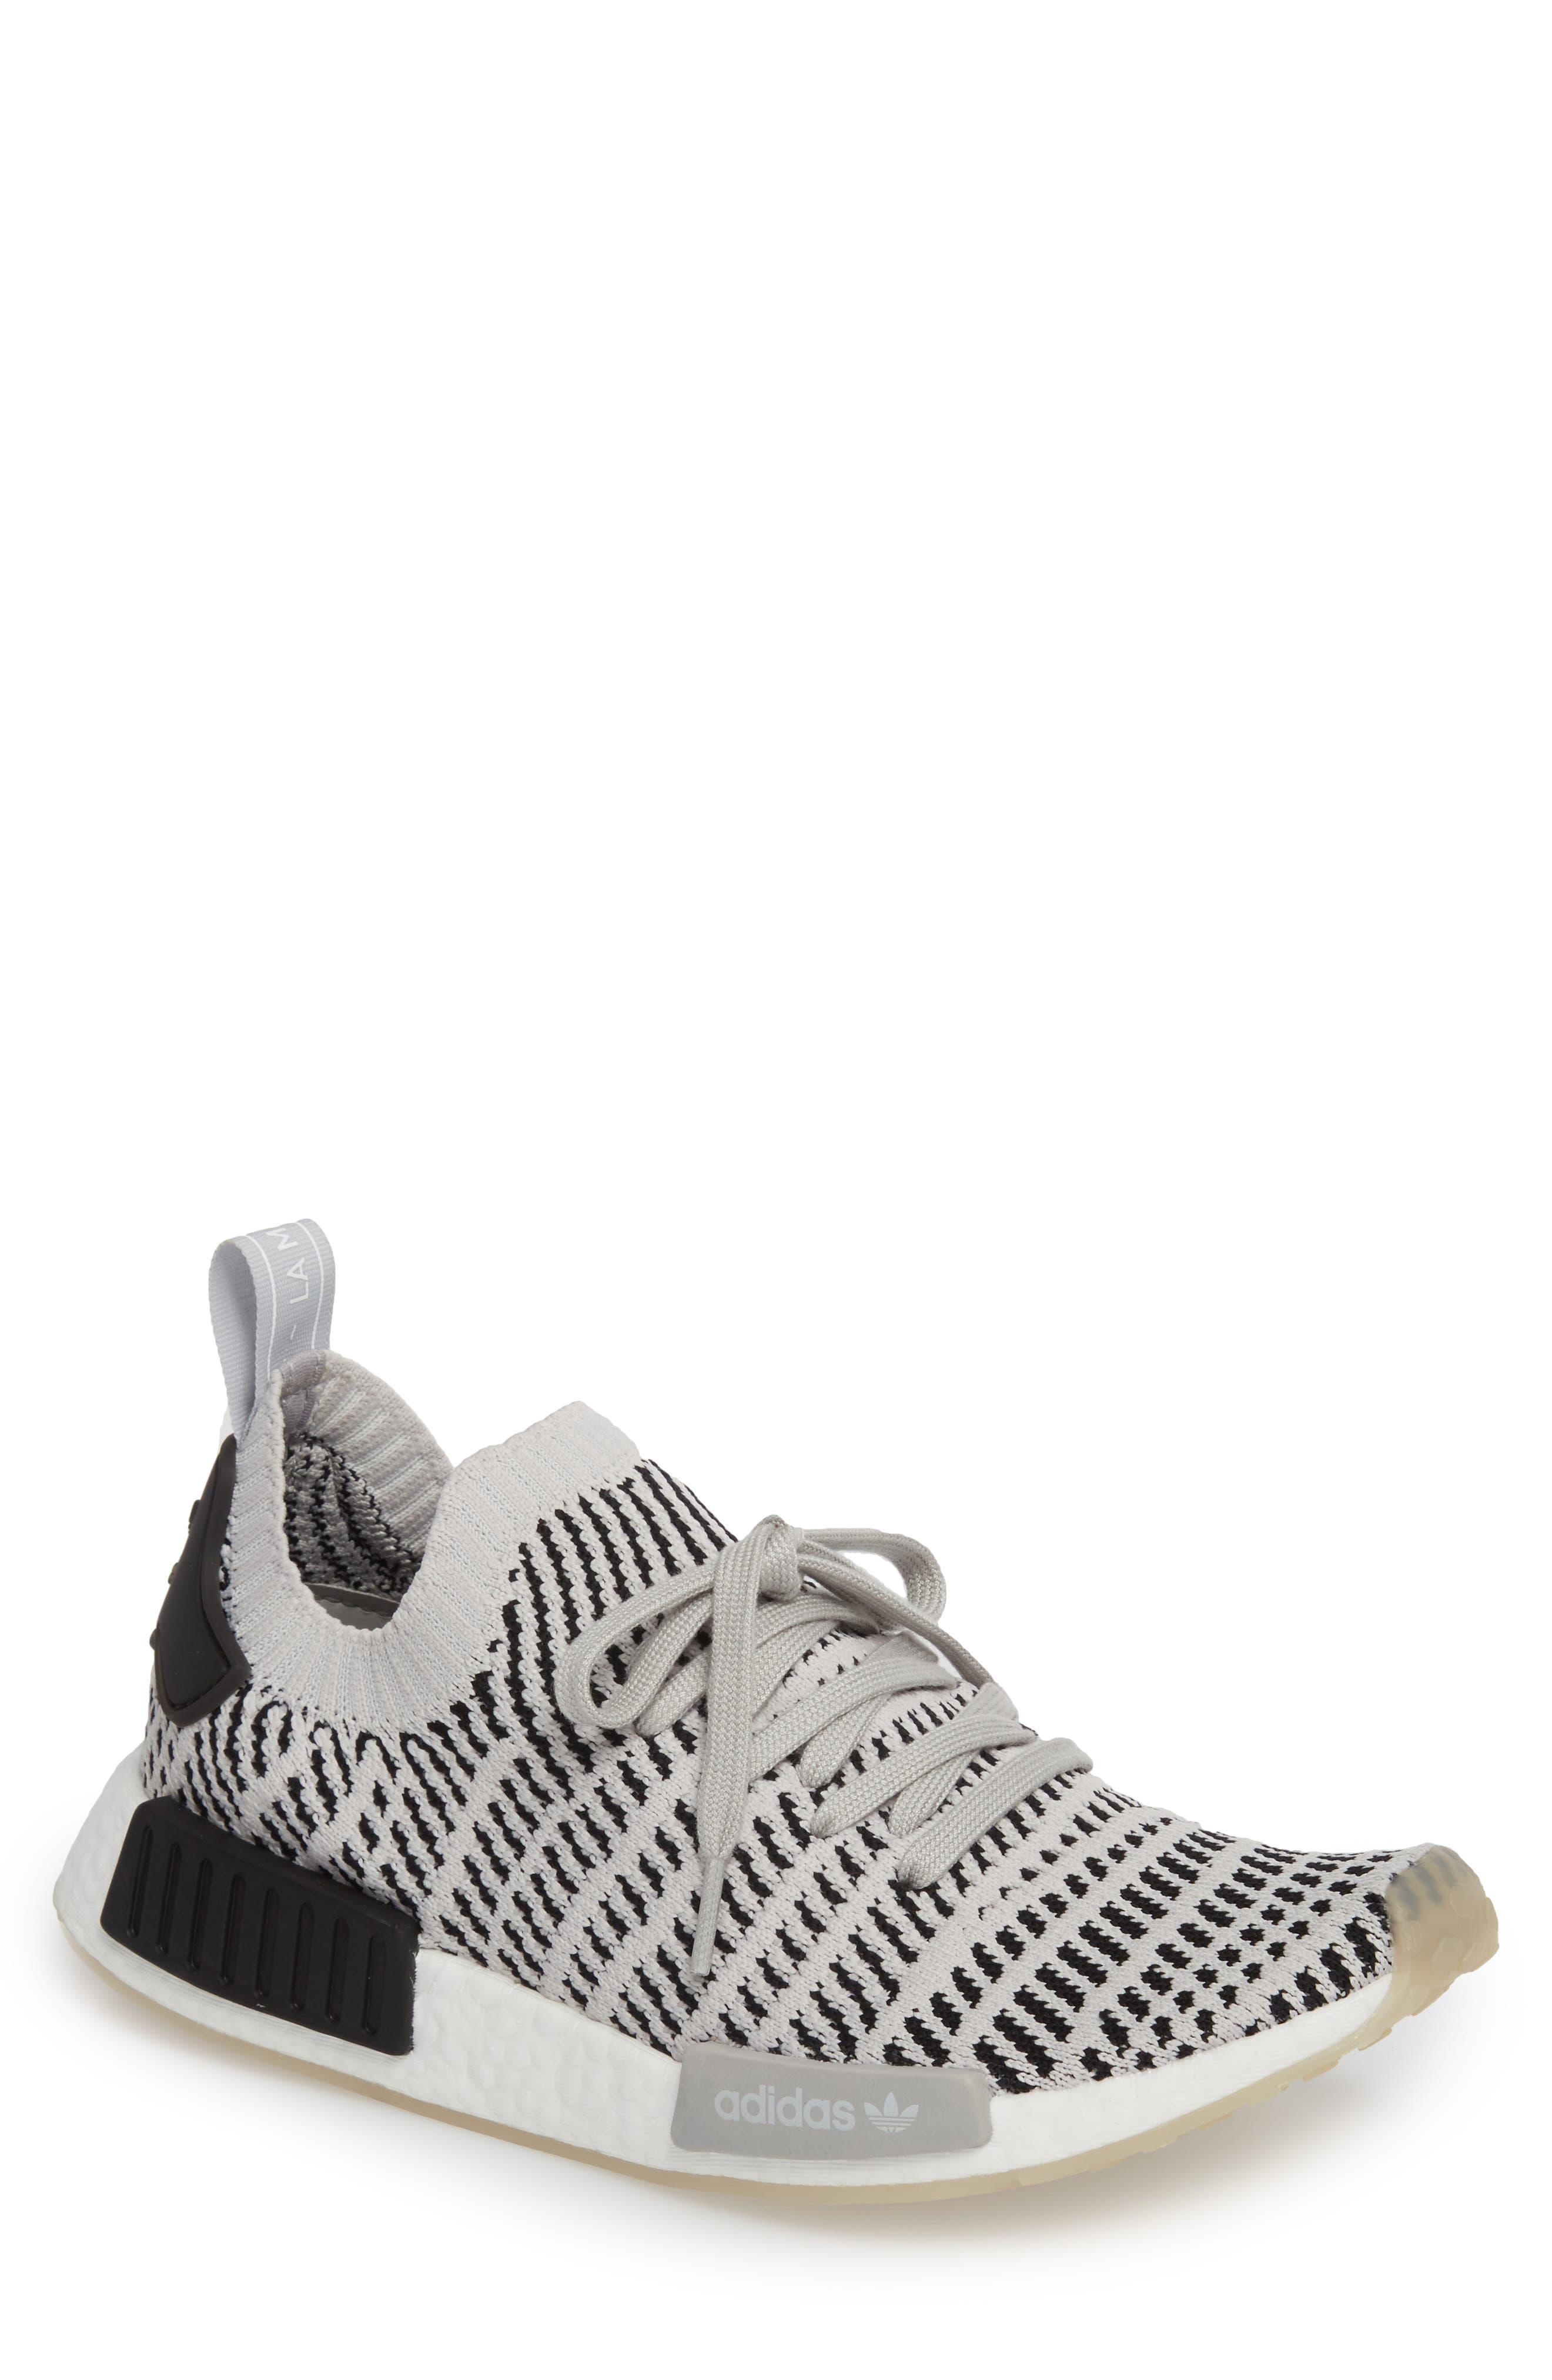 NMD R1 STLT Primeknit Sneaker,                             Main thumbnail 1, color,